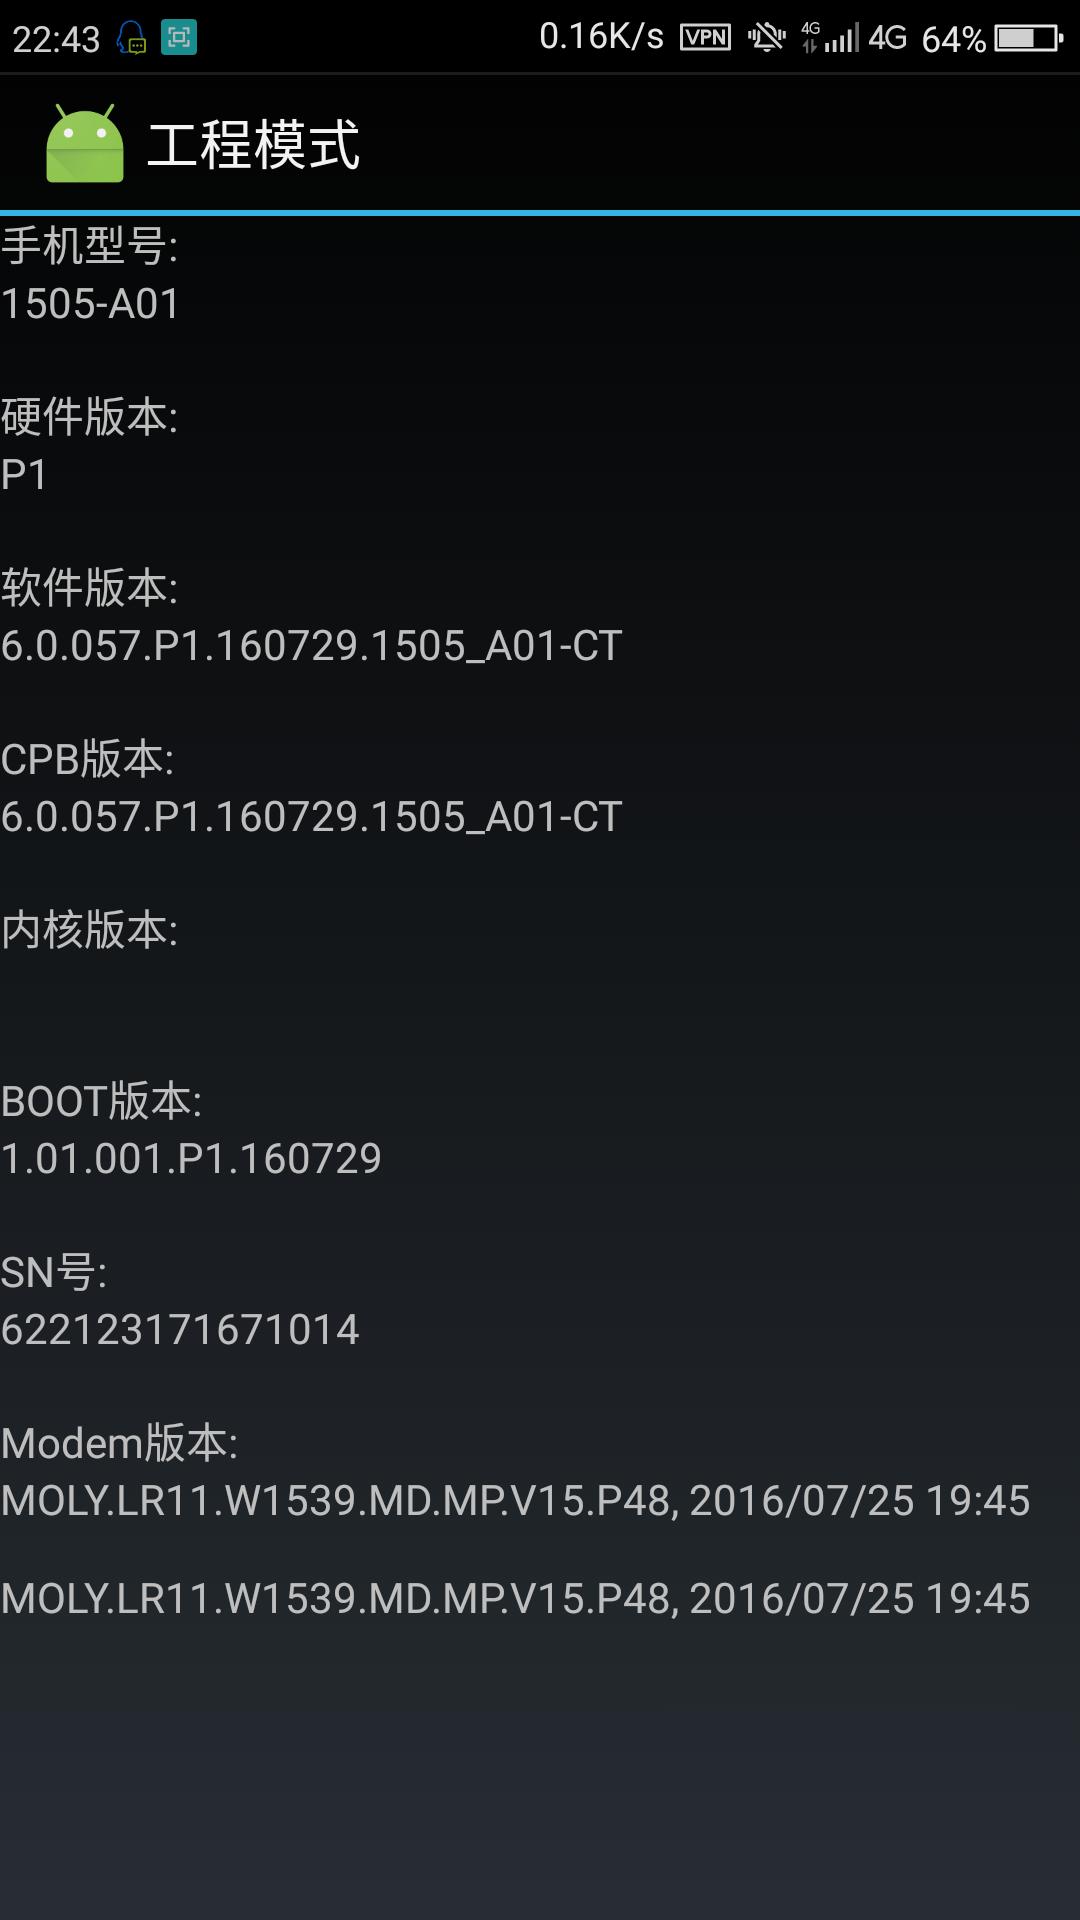 Screenshot_2016-08-09-22-43-51.png